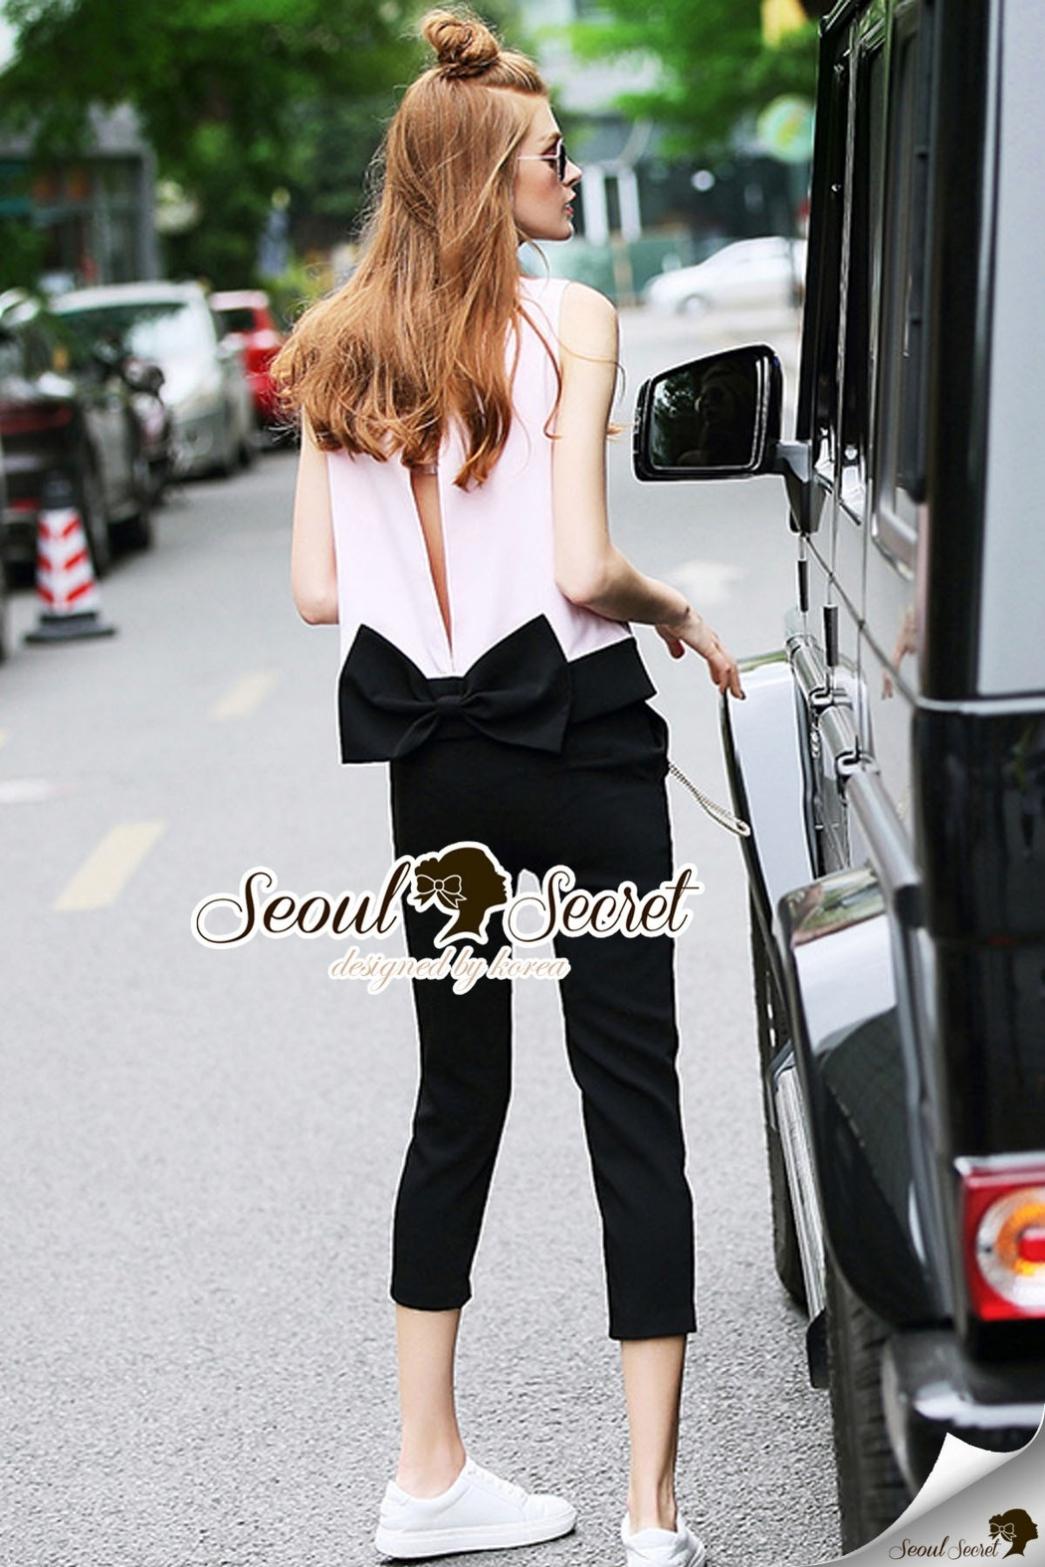 Seoul Secret Say's... Bowy Ladiest Back Splitty Set